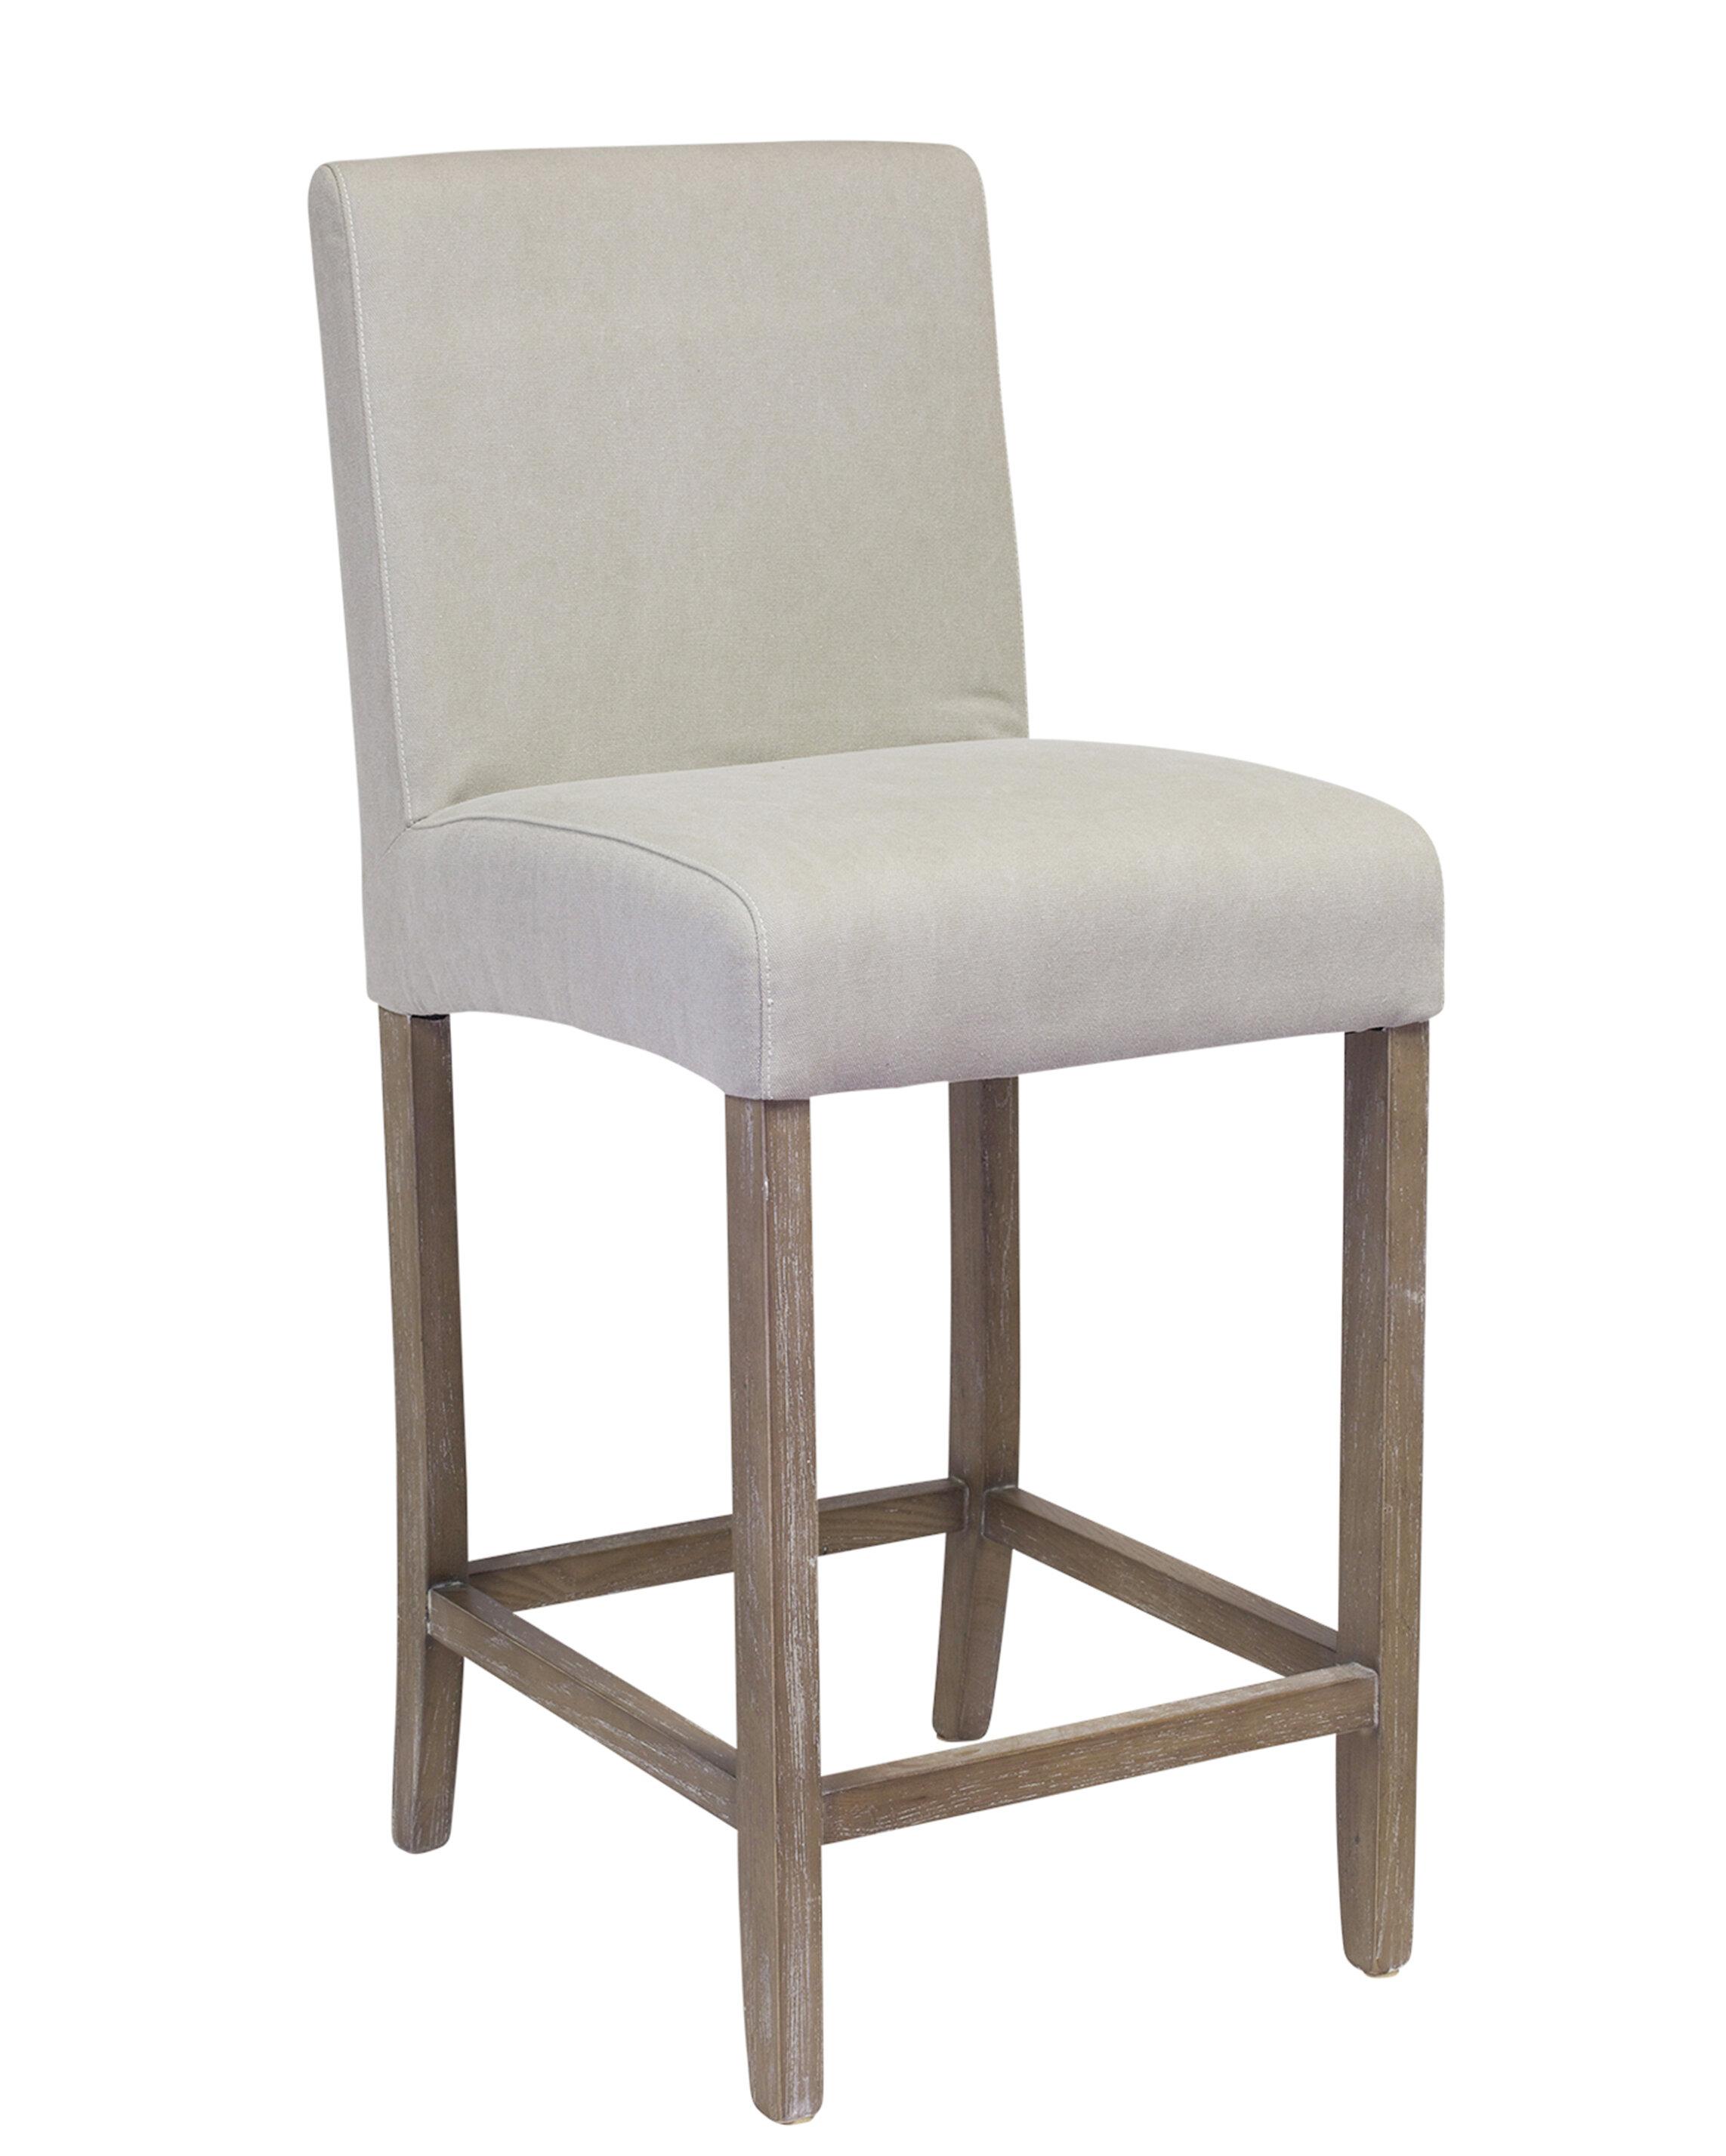 Design tree home james 25 25 counter height stool reviews wayfair